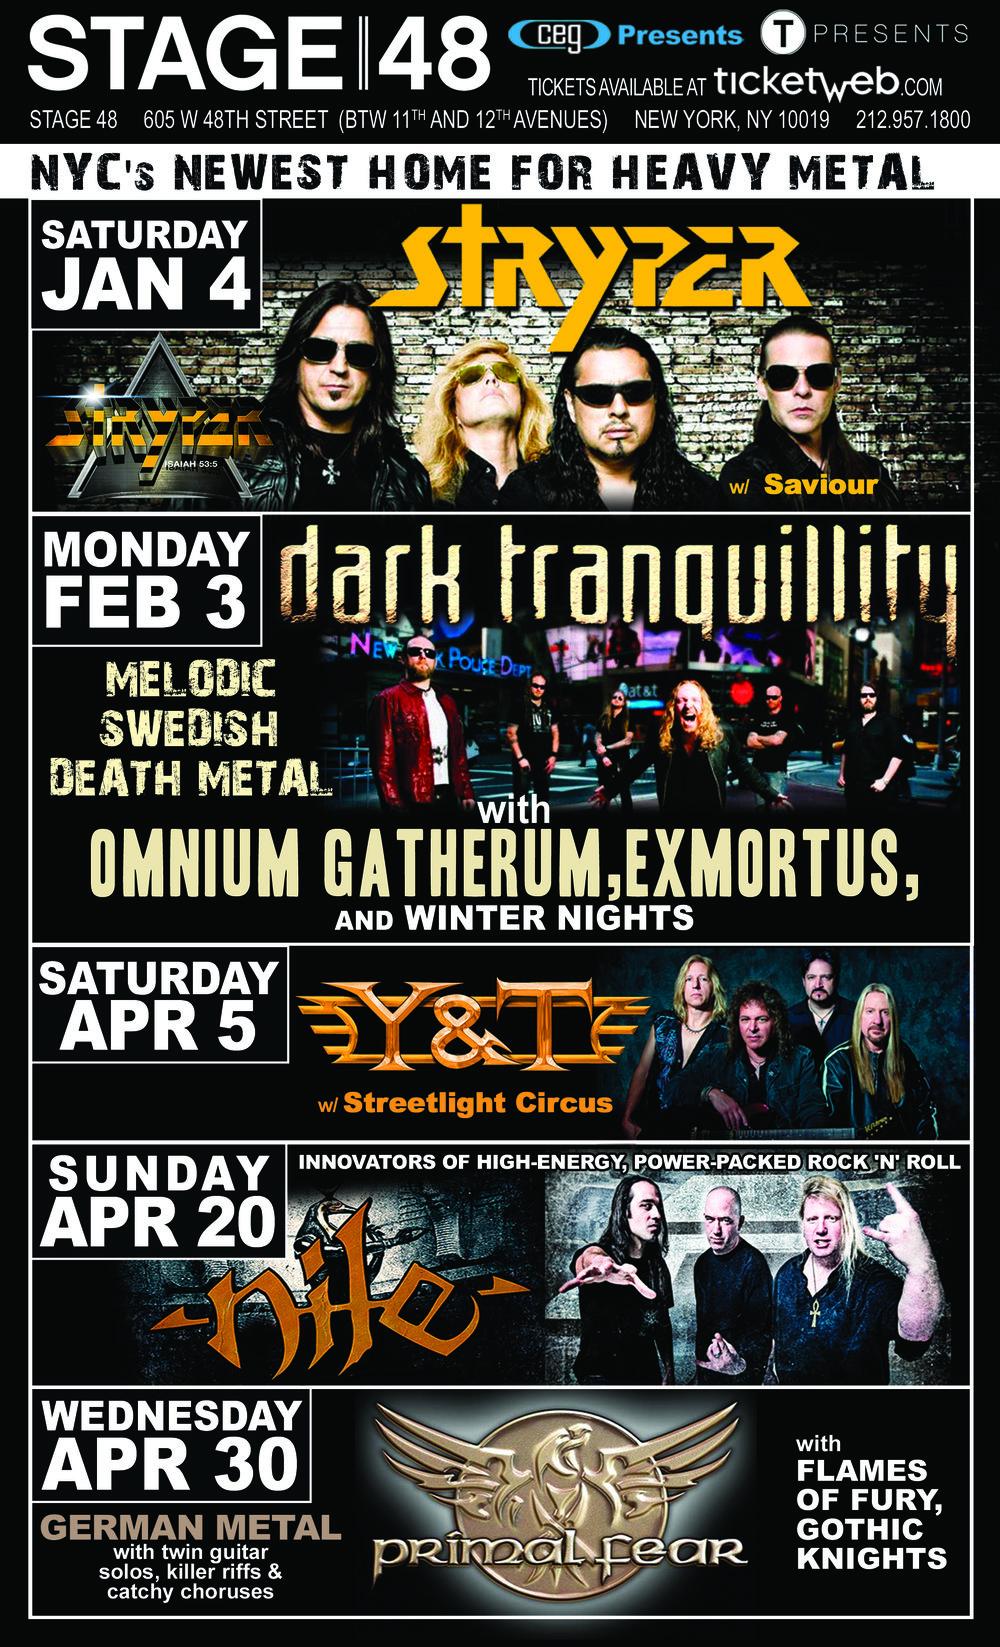 11-21-13 Metal poster (2).jpg